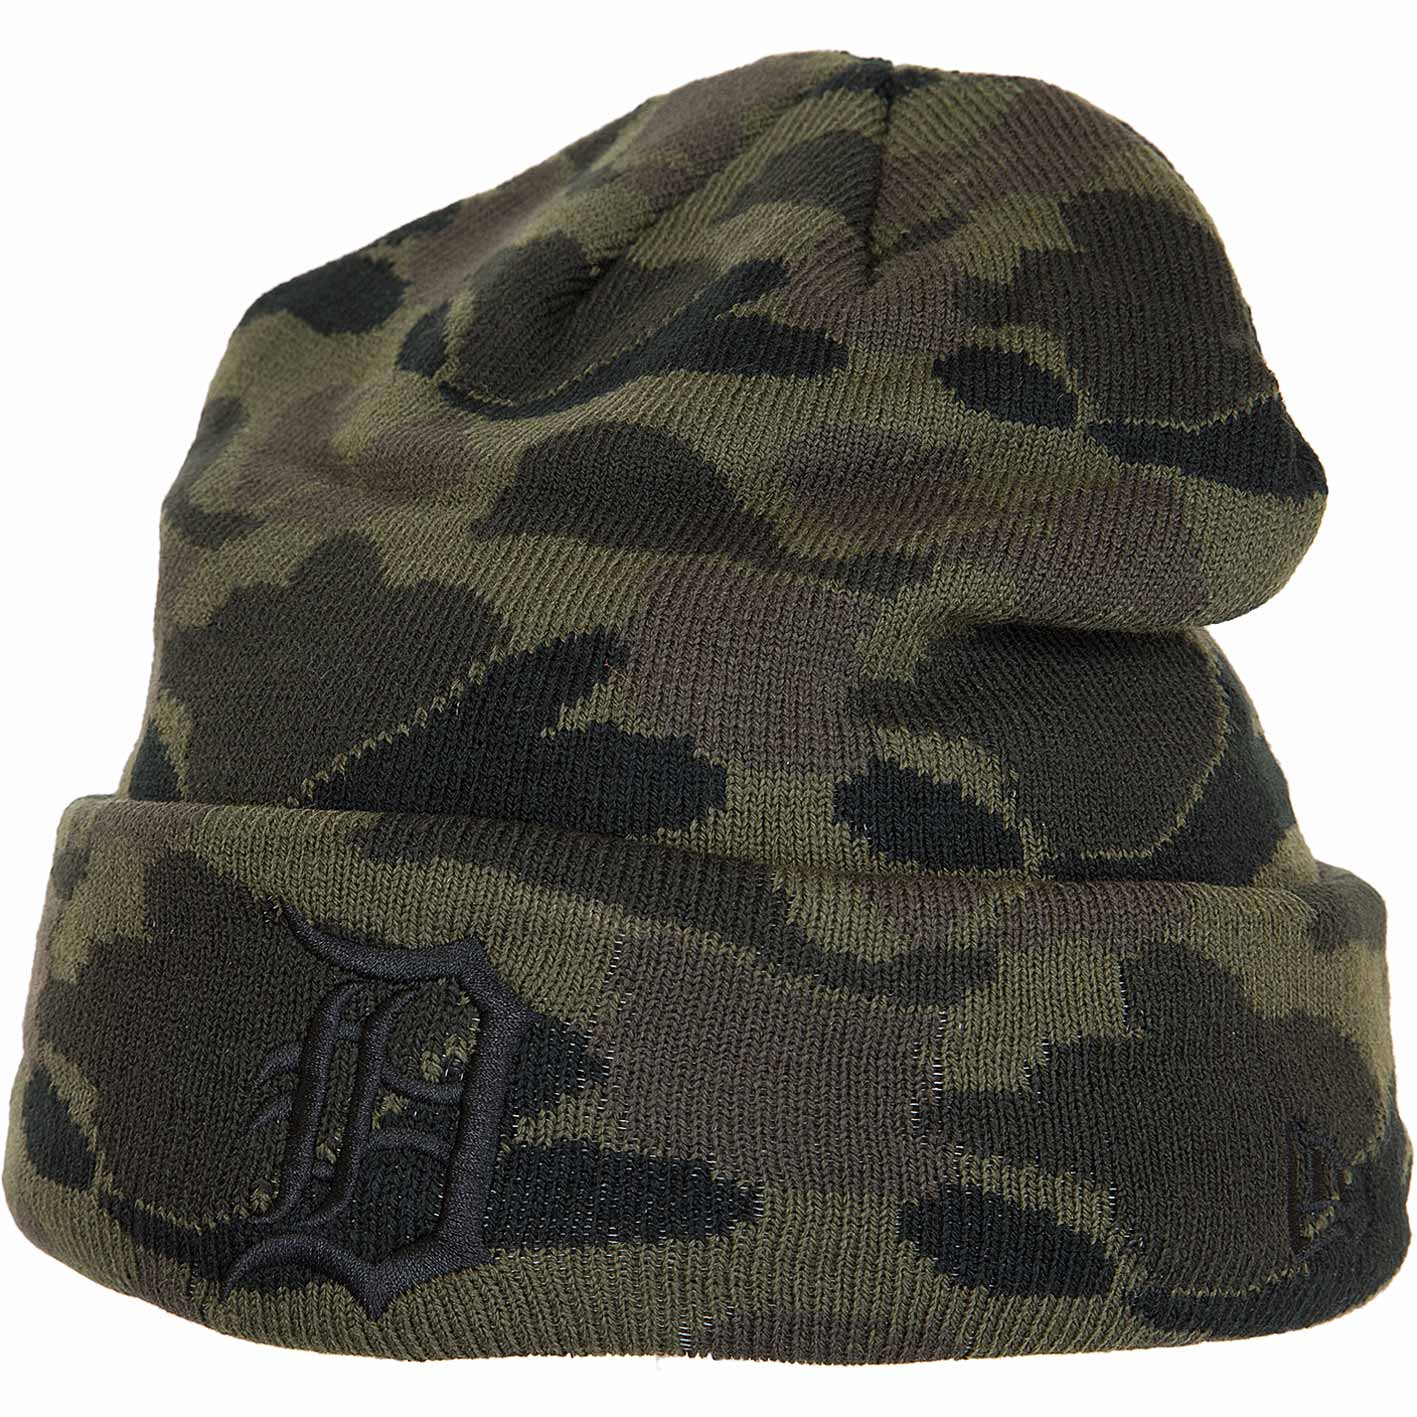 quality design 04b01 0fcc2 New Era Beanie Camo Cuff Knit Detroit Tigers Camouflage Hier